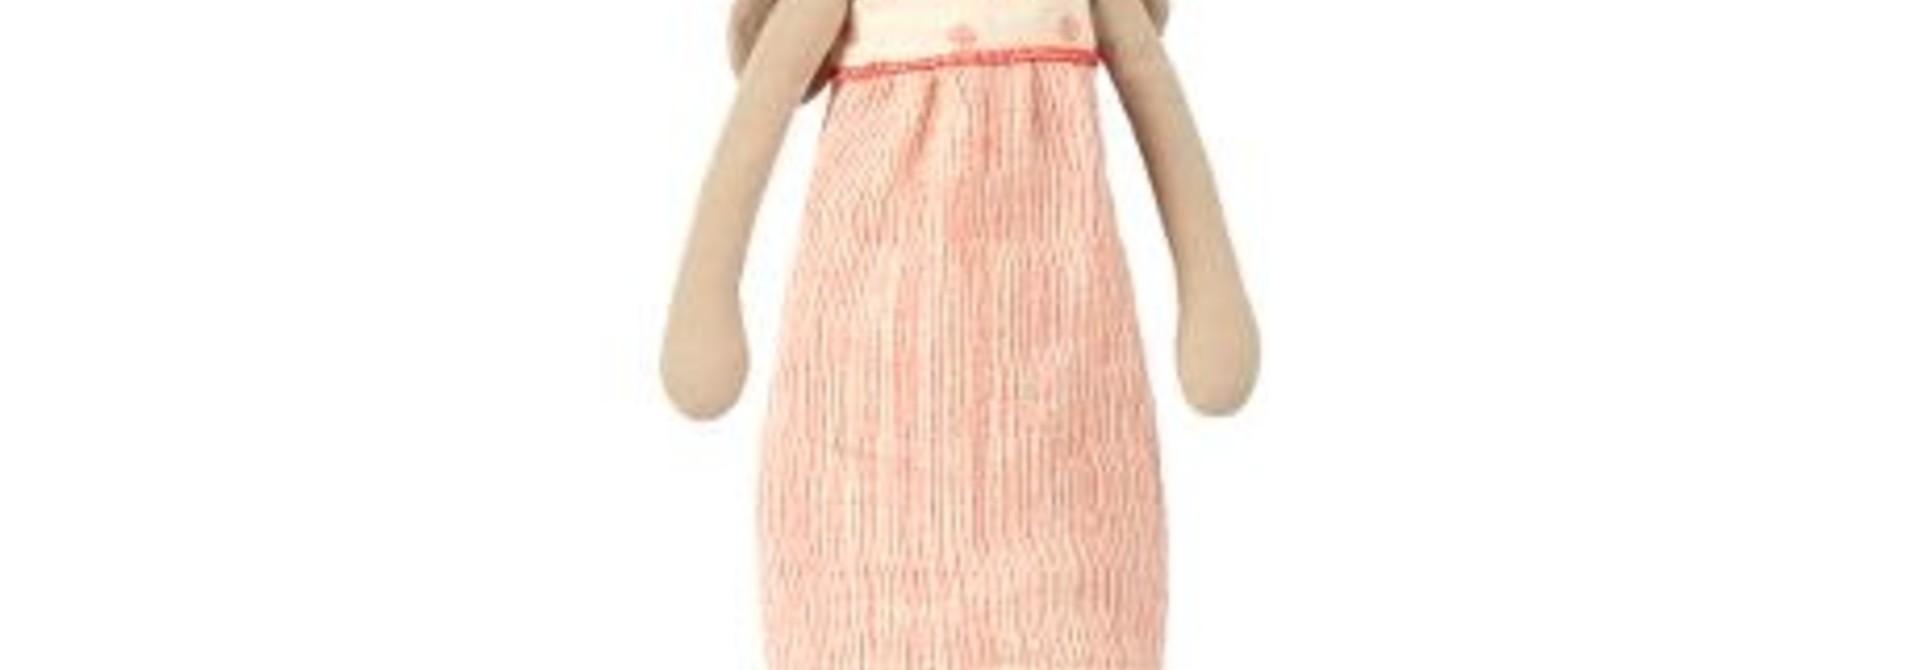 Bunny Size 3 - Dress - Off White